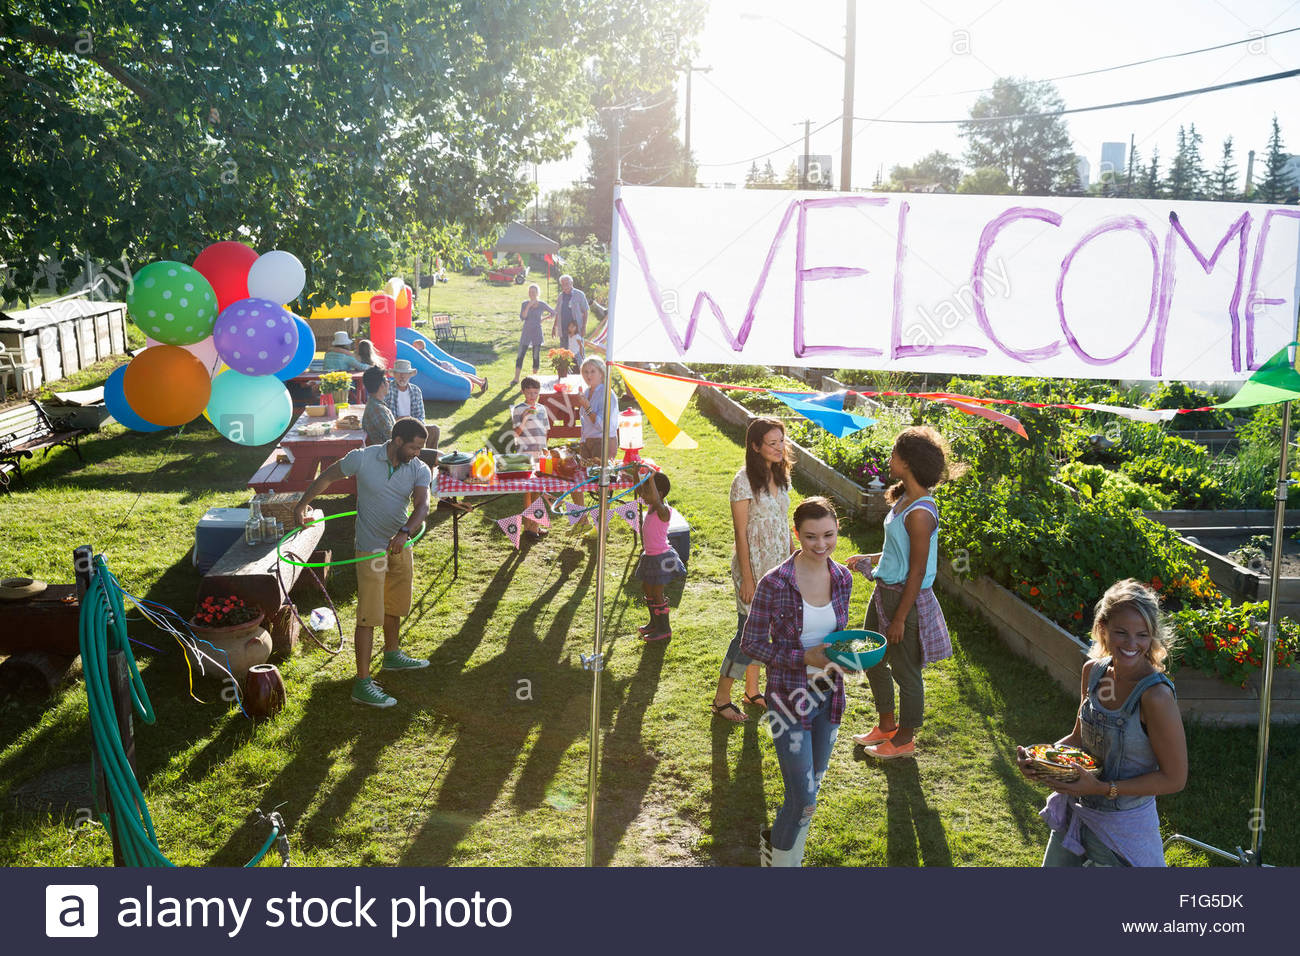 Neighbors enjoying party in sunny park - Stock Image